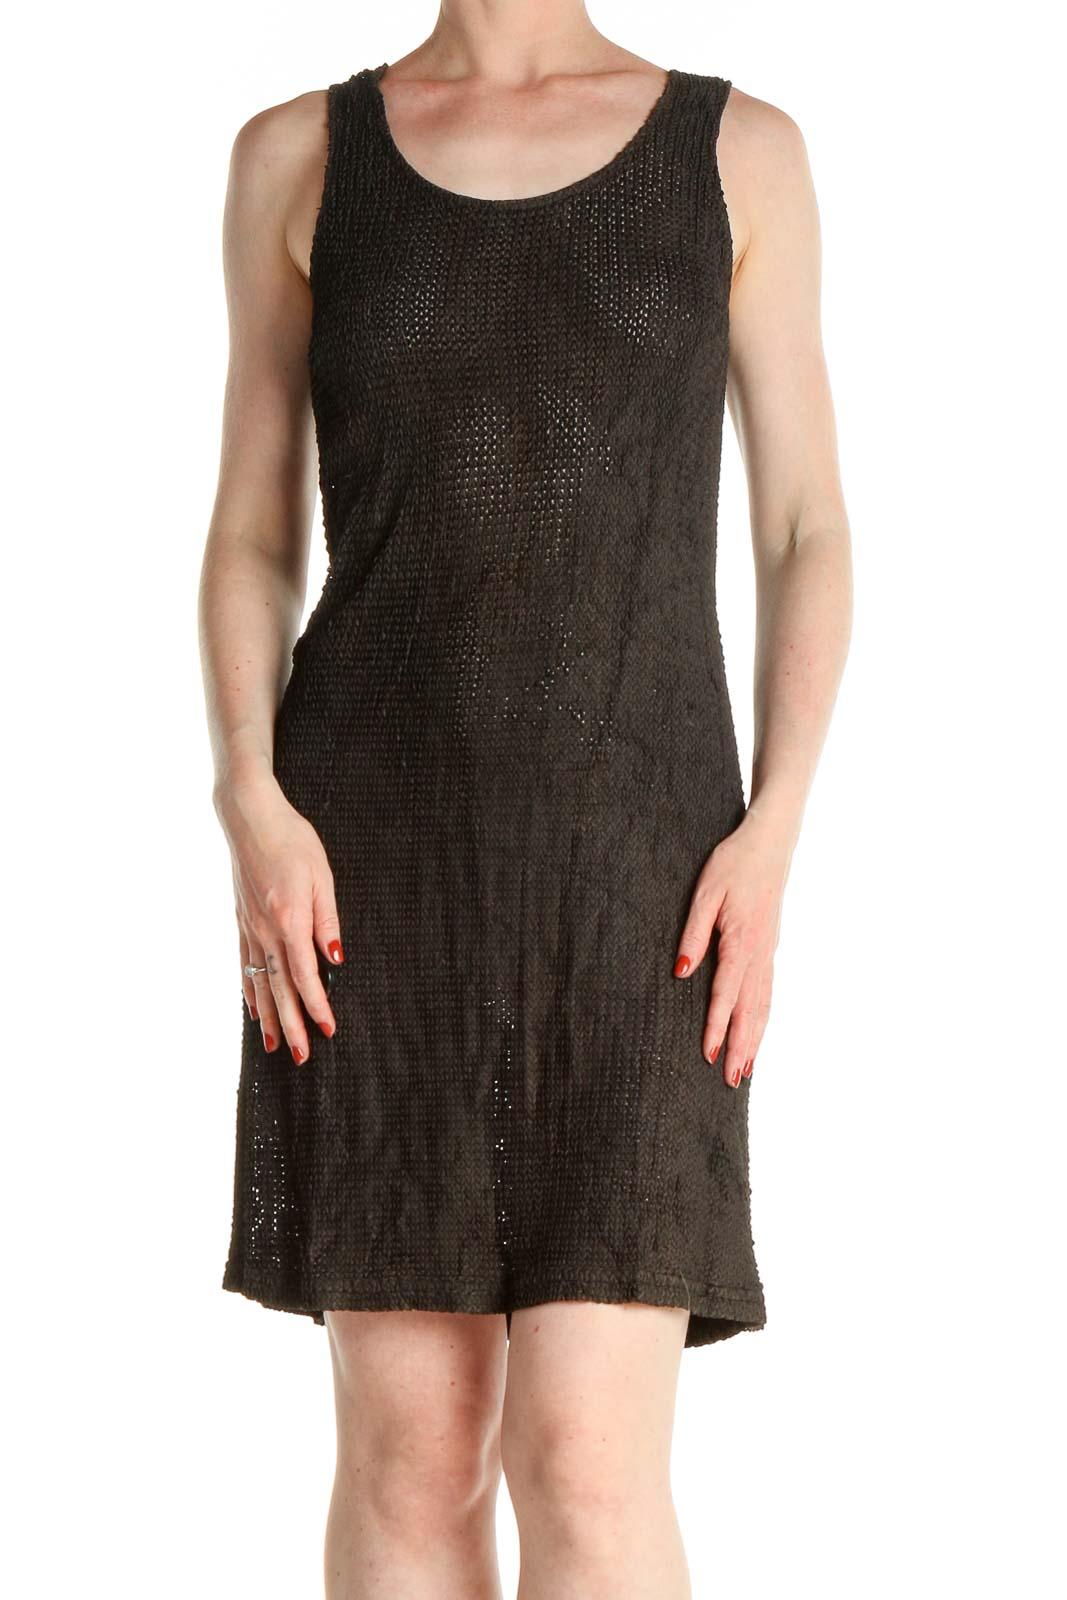 Black Day A-Line Mesh Dress Front